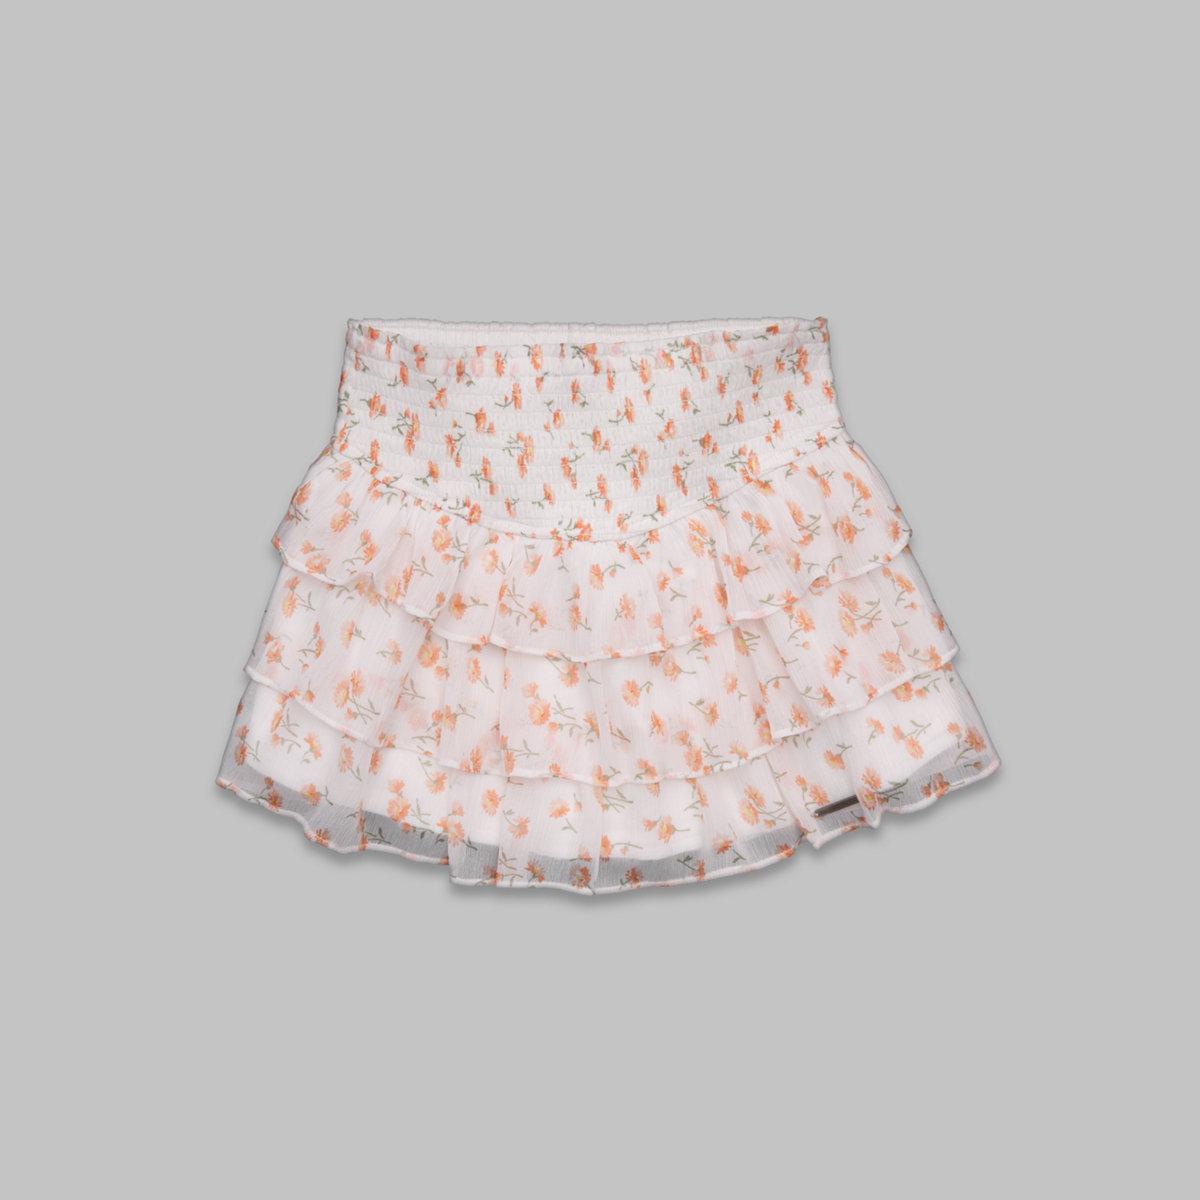 Eve Skirt